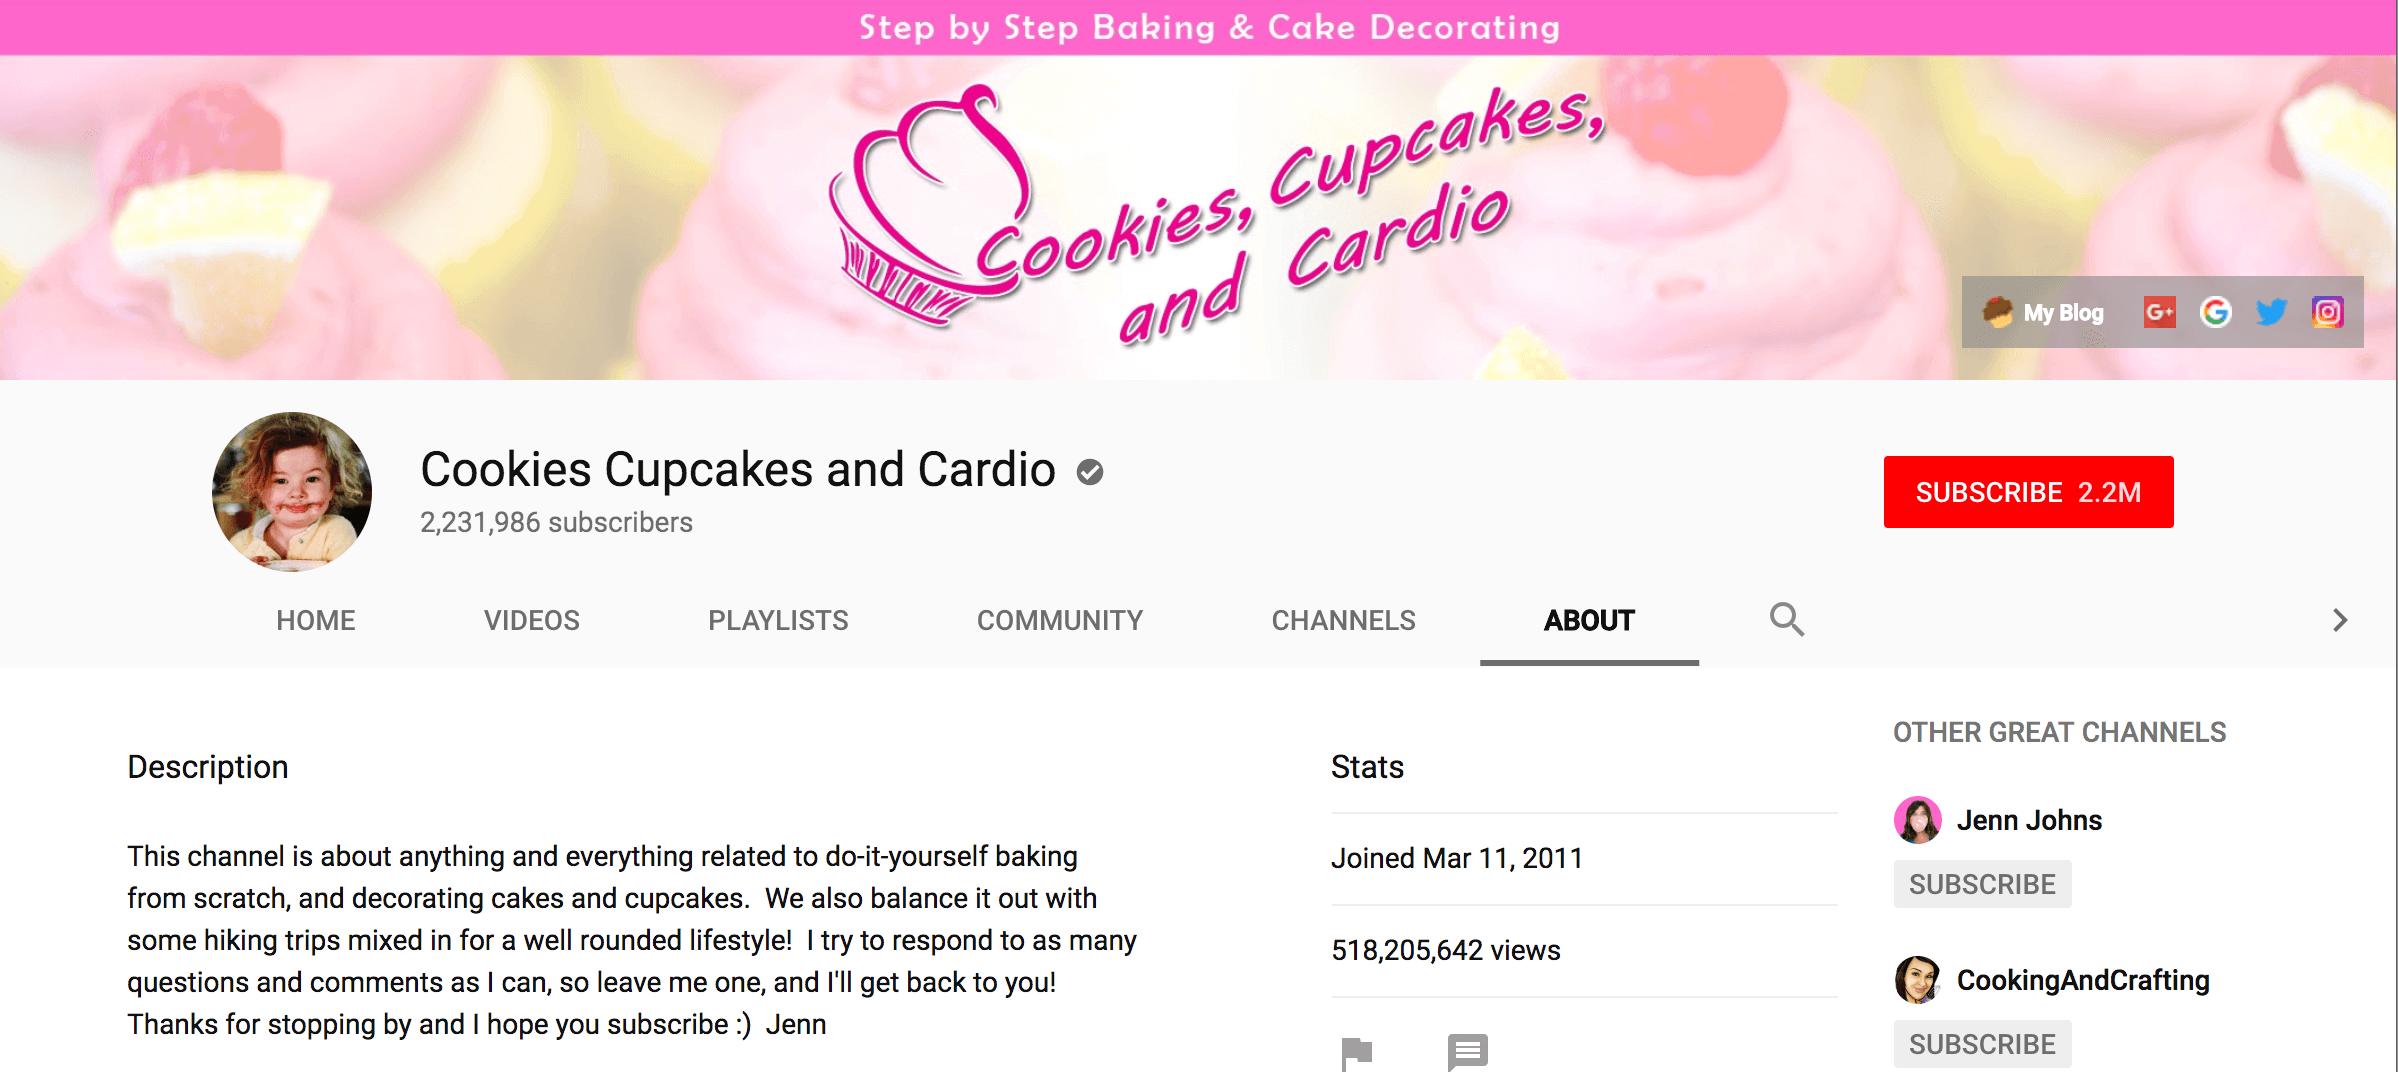 Cookies, Cupcakes & Cardio